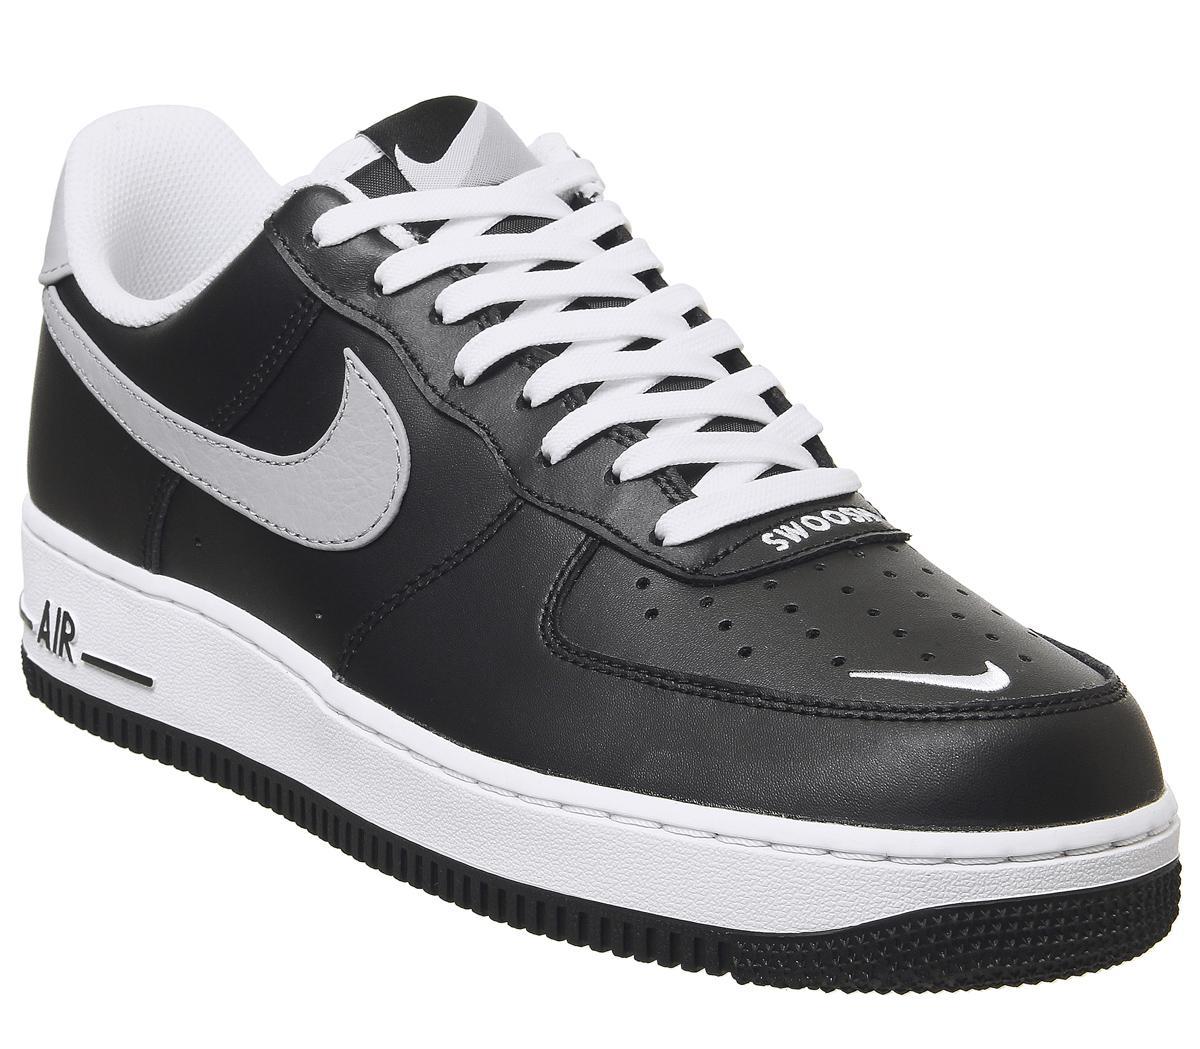 Nike Air Force 1 Lv8 Trainers Black